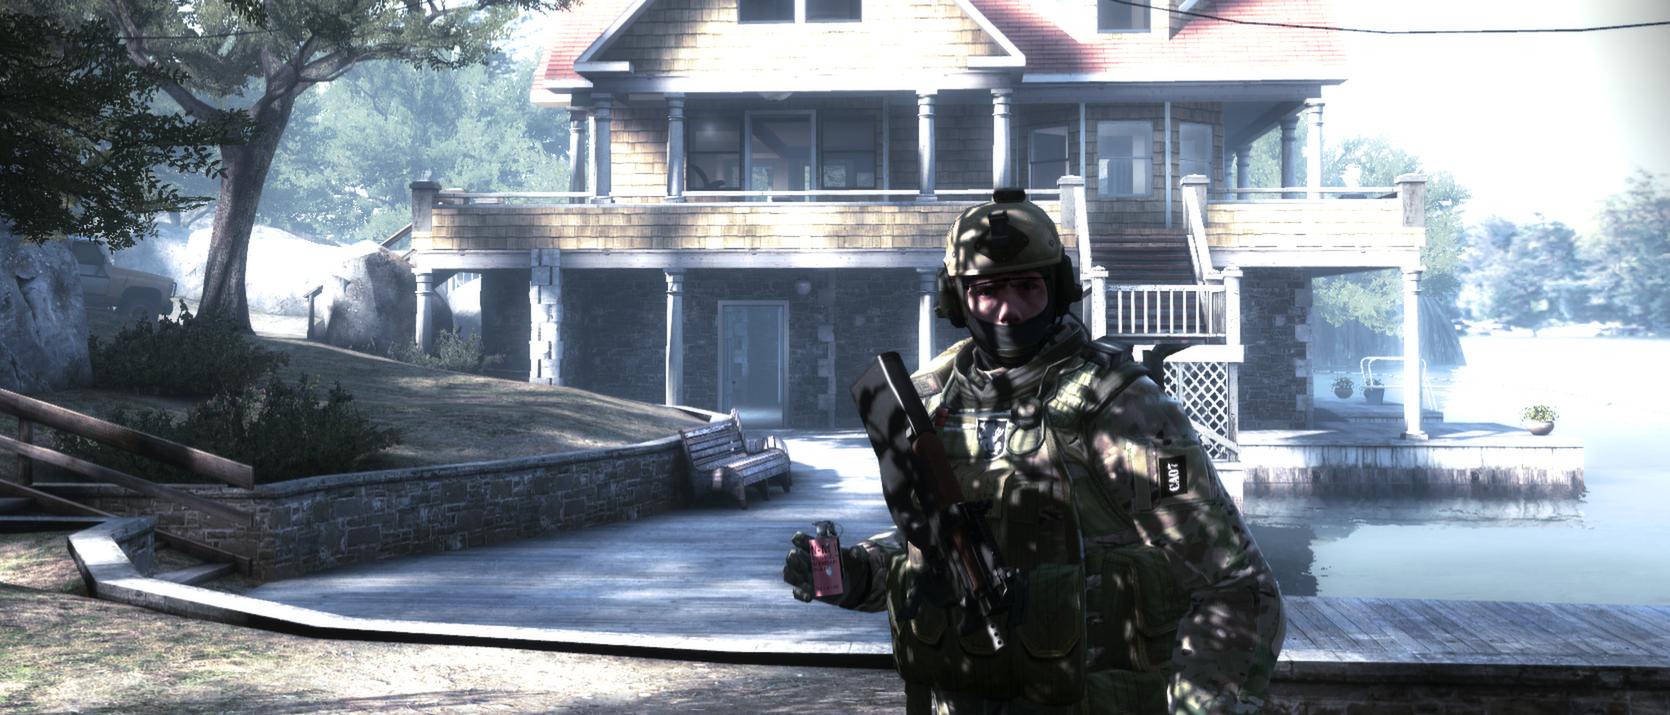 Image - Csgo screenshot5.jpg Counter Strike Online Wiki Fand